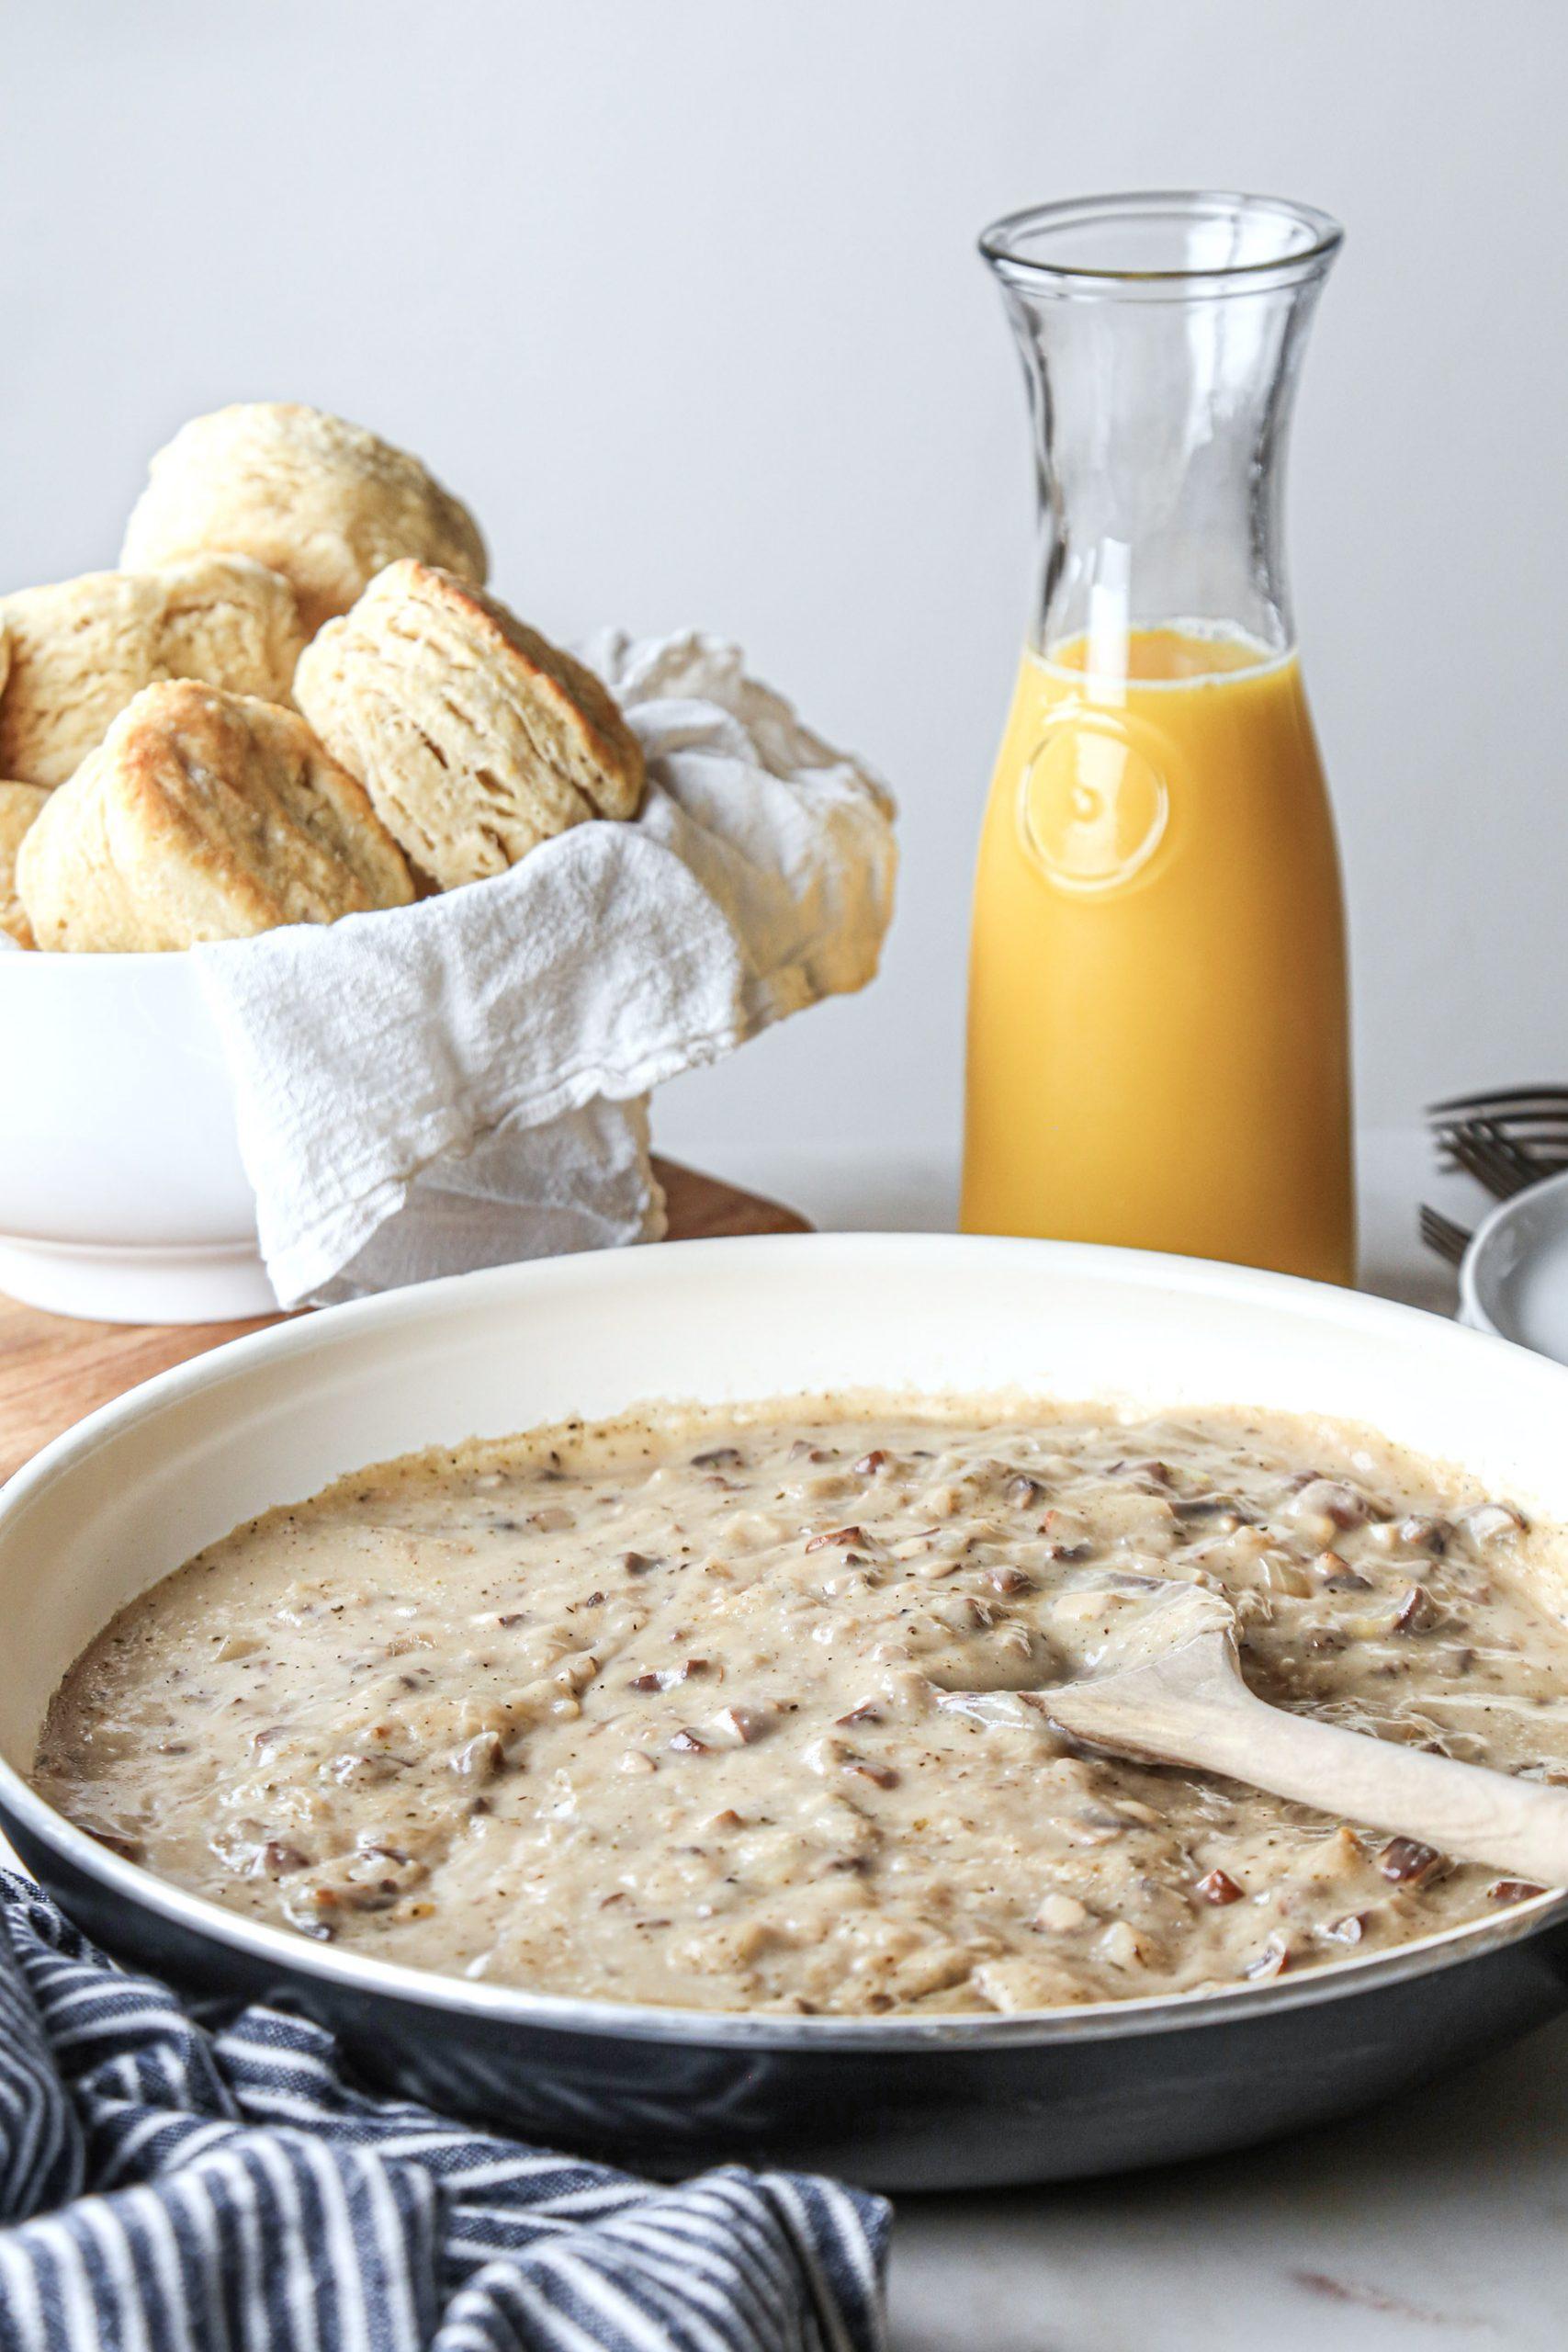 Fluffy Biscuits with Mushroom Gravy | Vegan with Gluten-Free Option